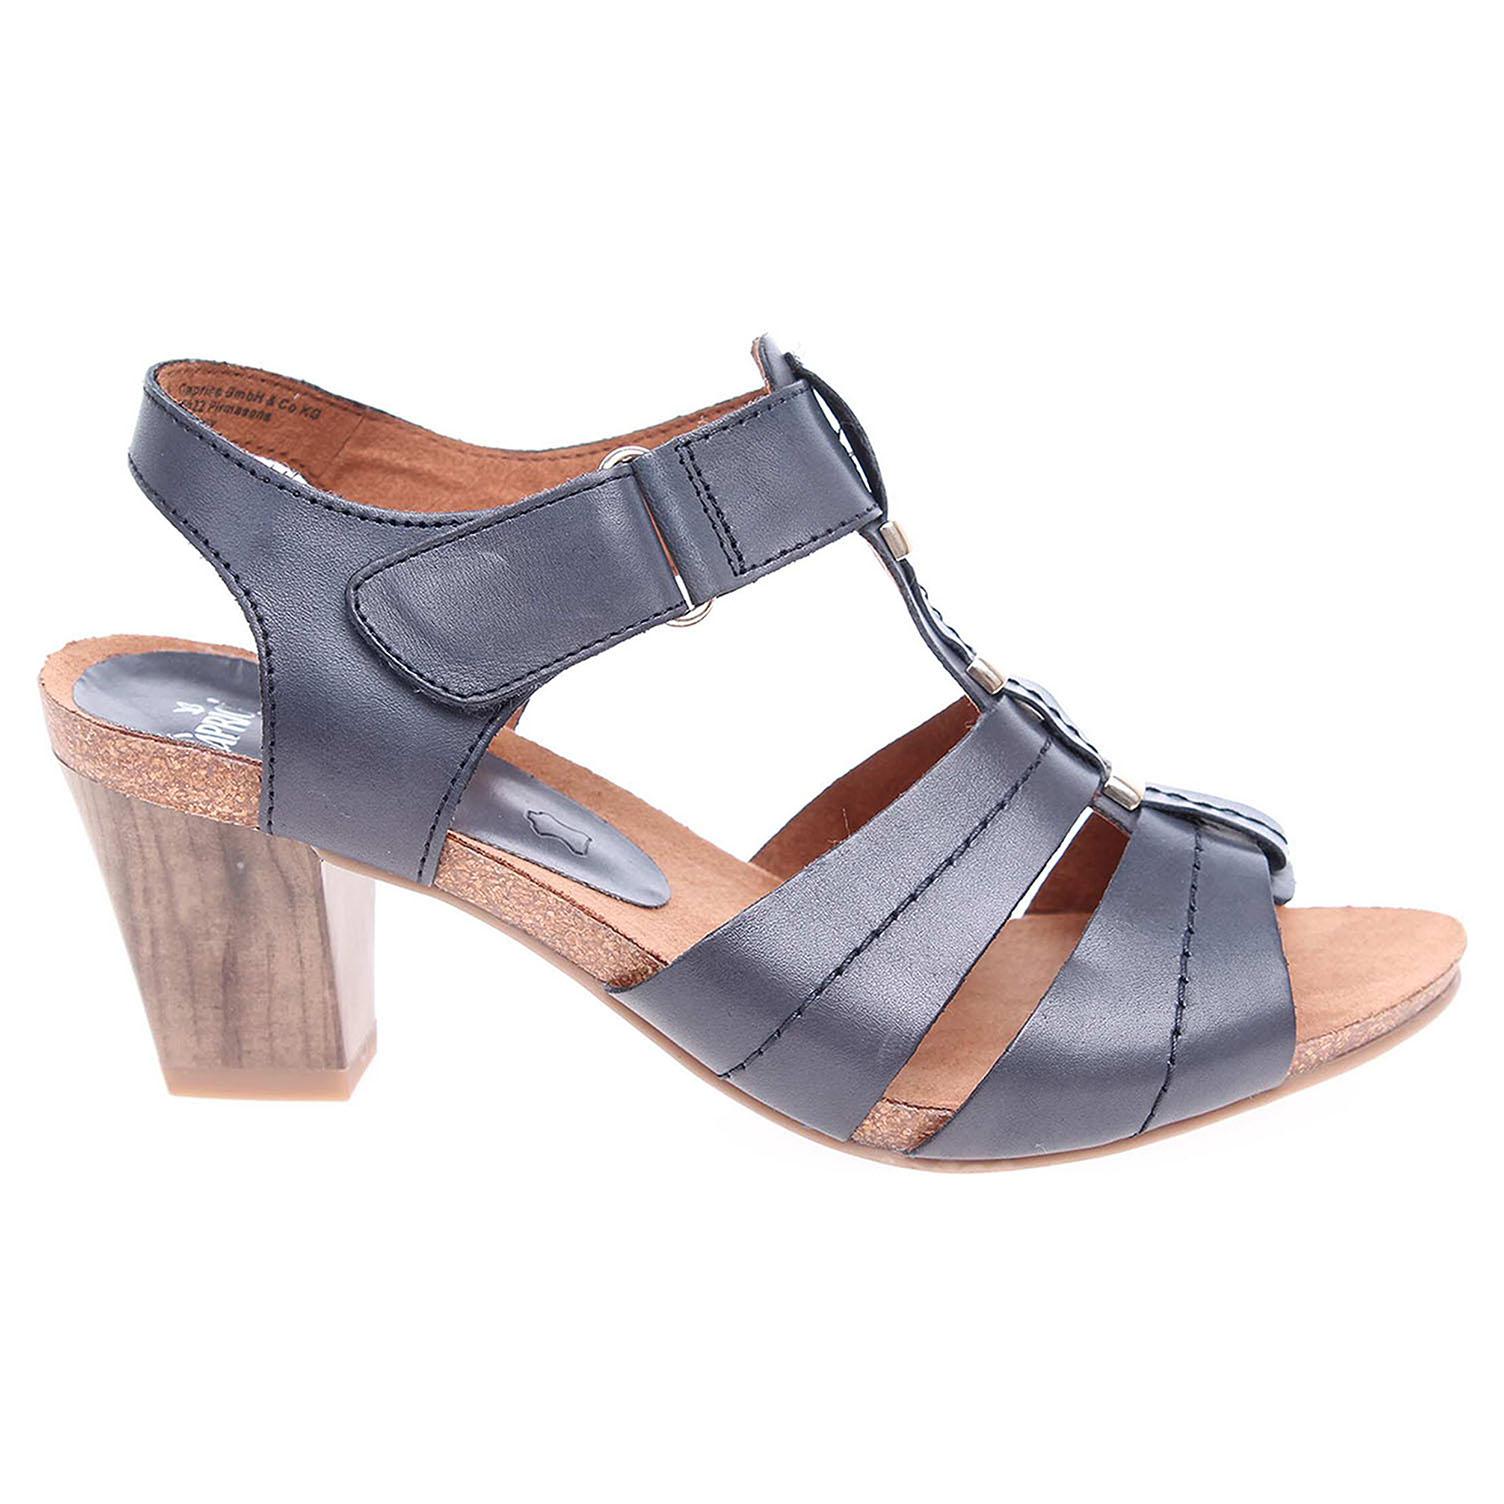 Ecco Caprice dámské sandály 9-28309-28 modré 23801122